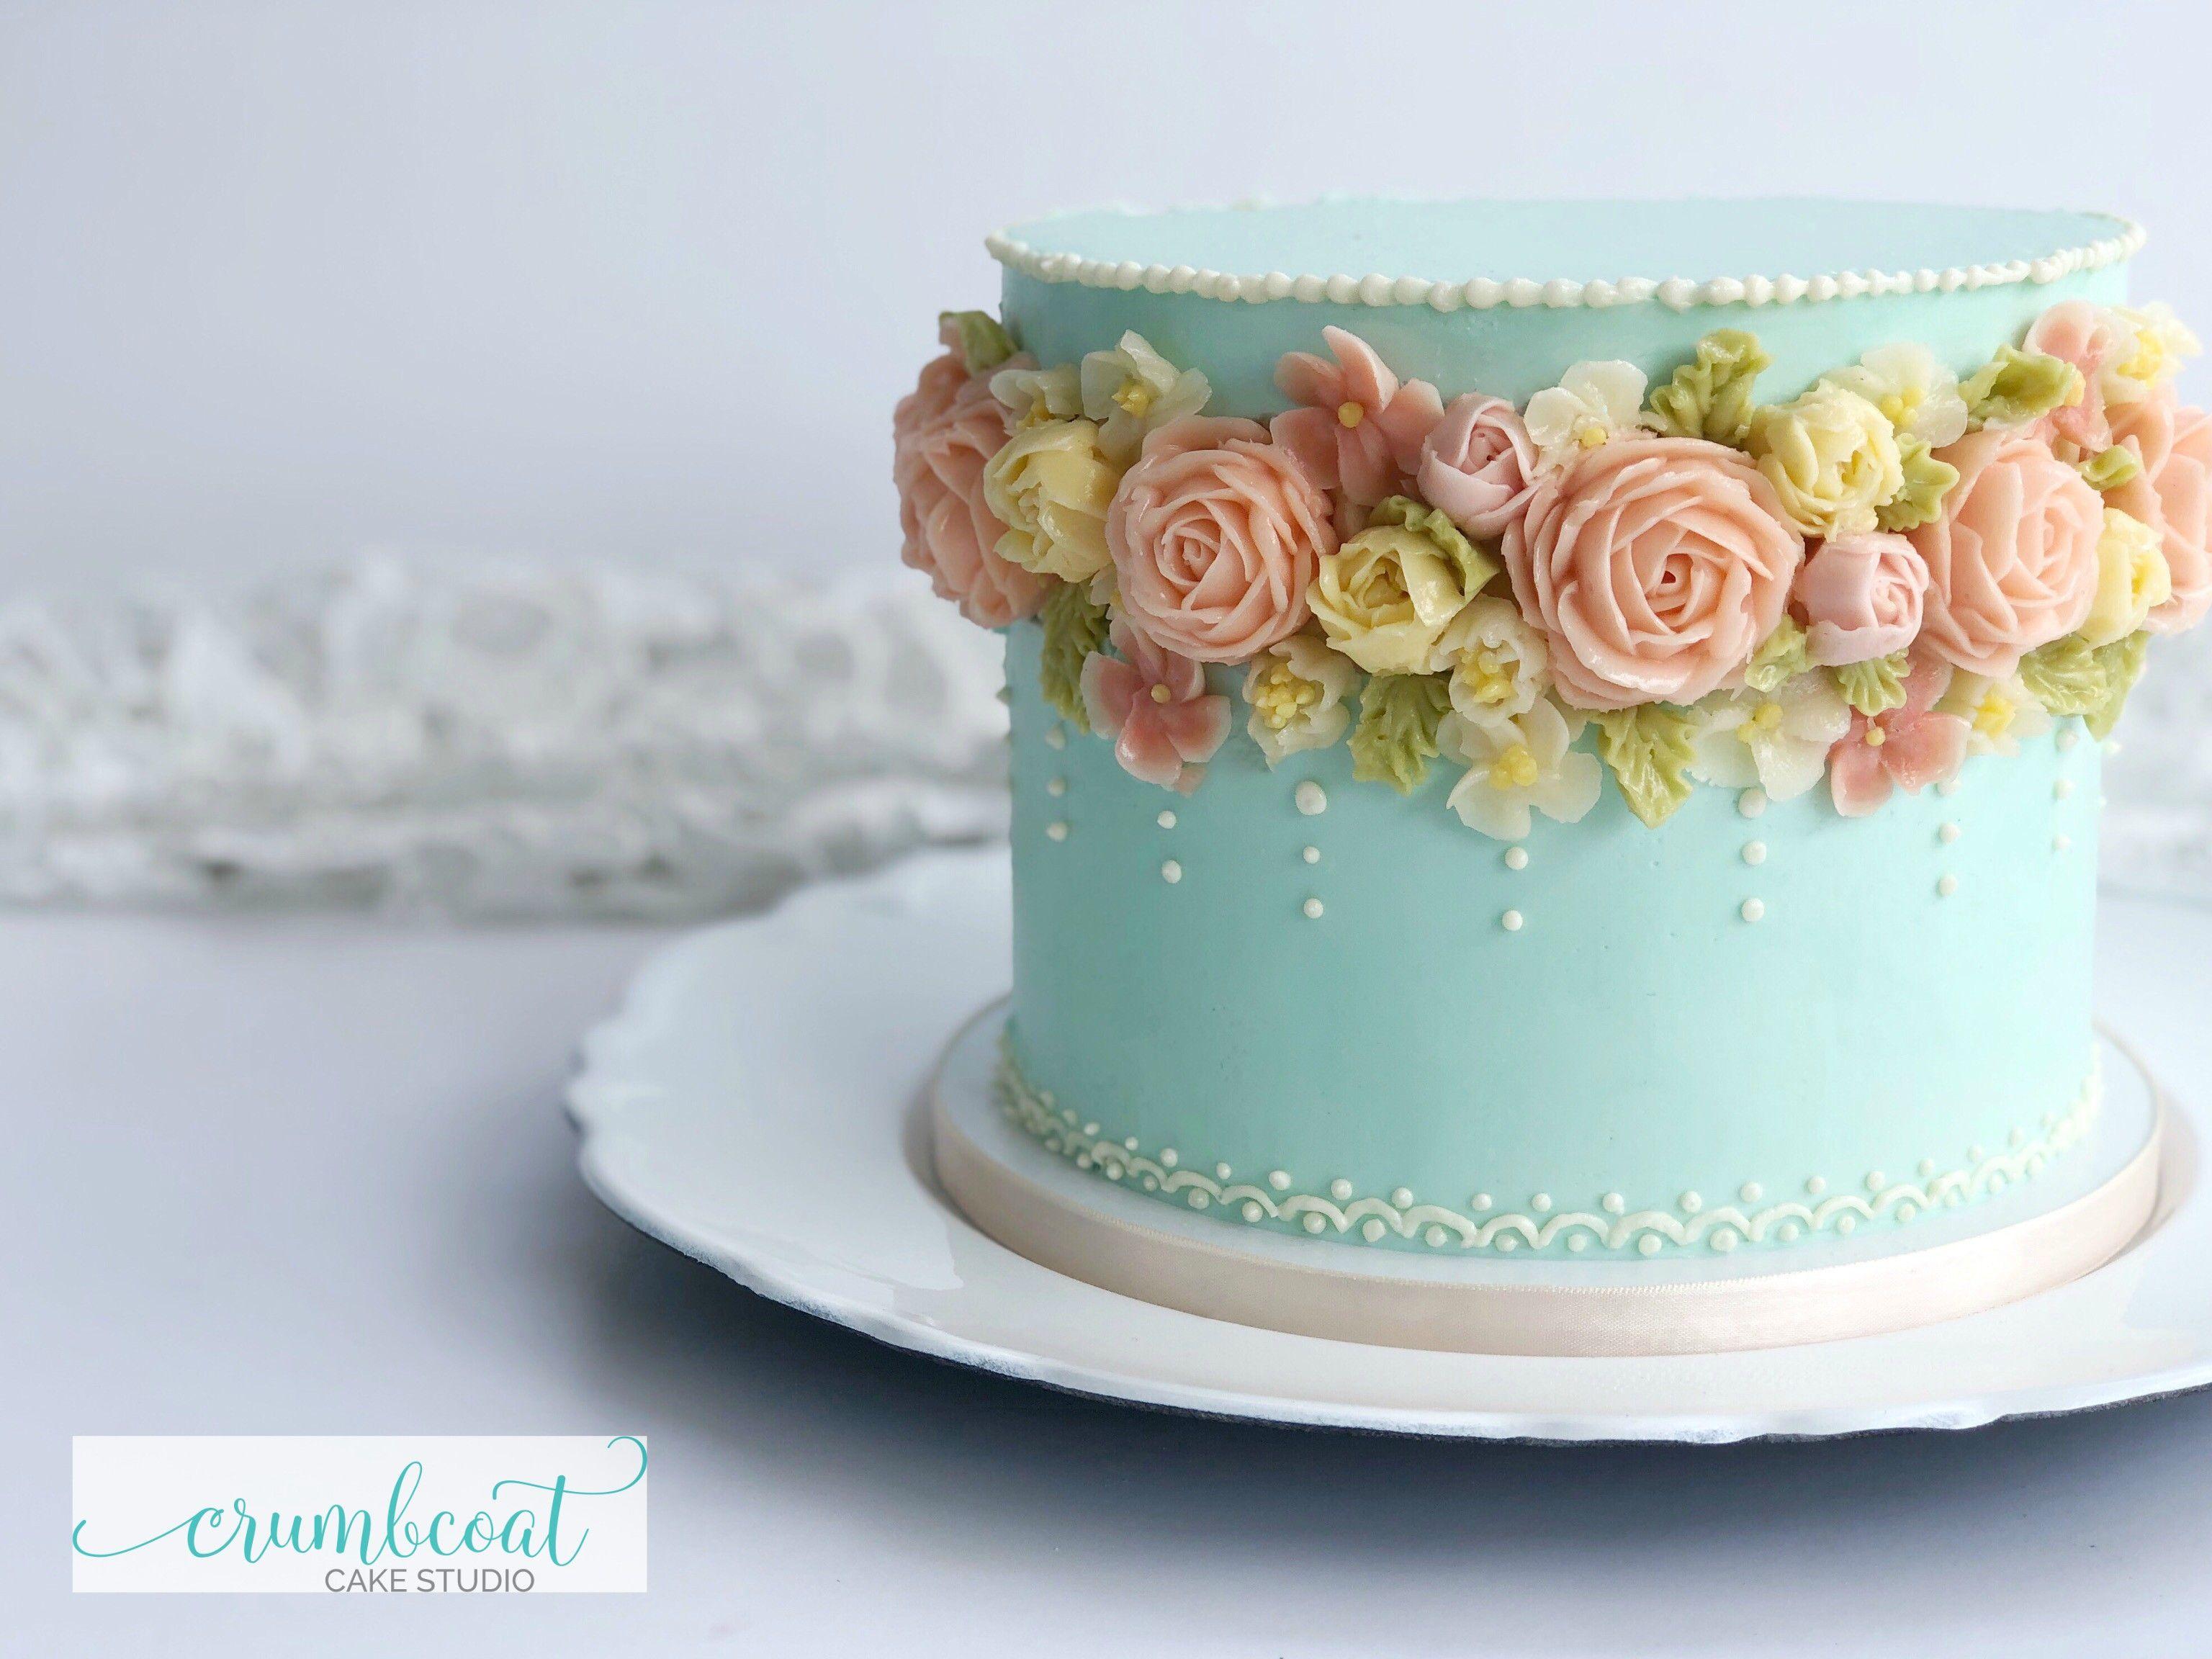 Vintage Blue Buttercream Cake Cake Decorating Designs Buttercream Cake Designs Cake Decorating Frosting